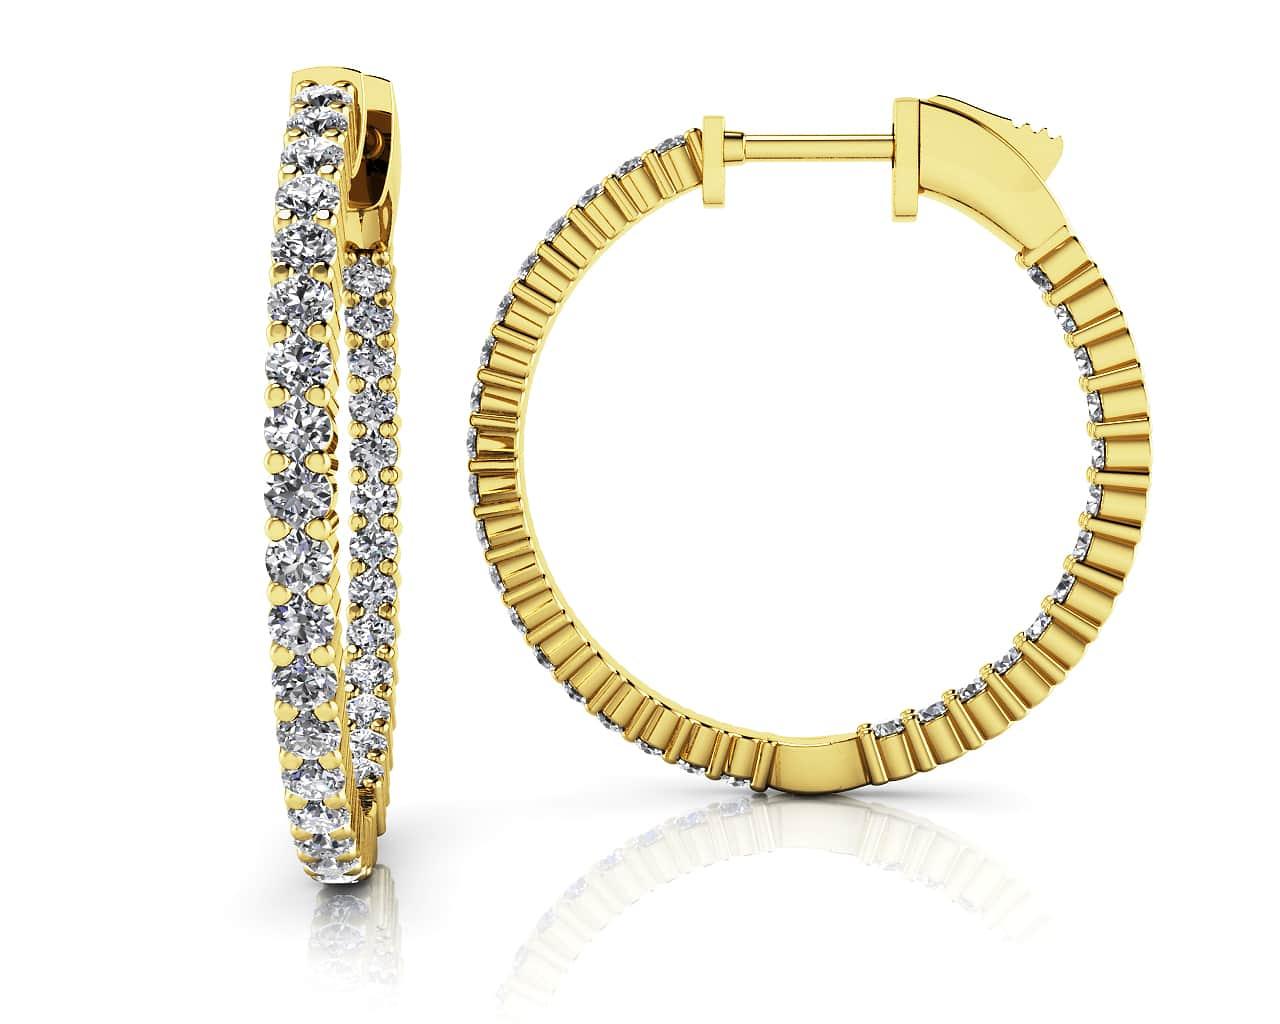 41dff55781f6 Single Row Inside Out Diamond Hoop Earring Small